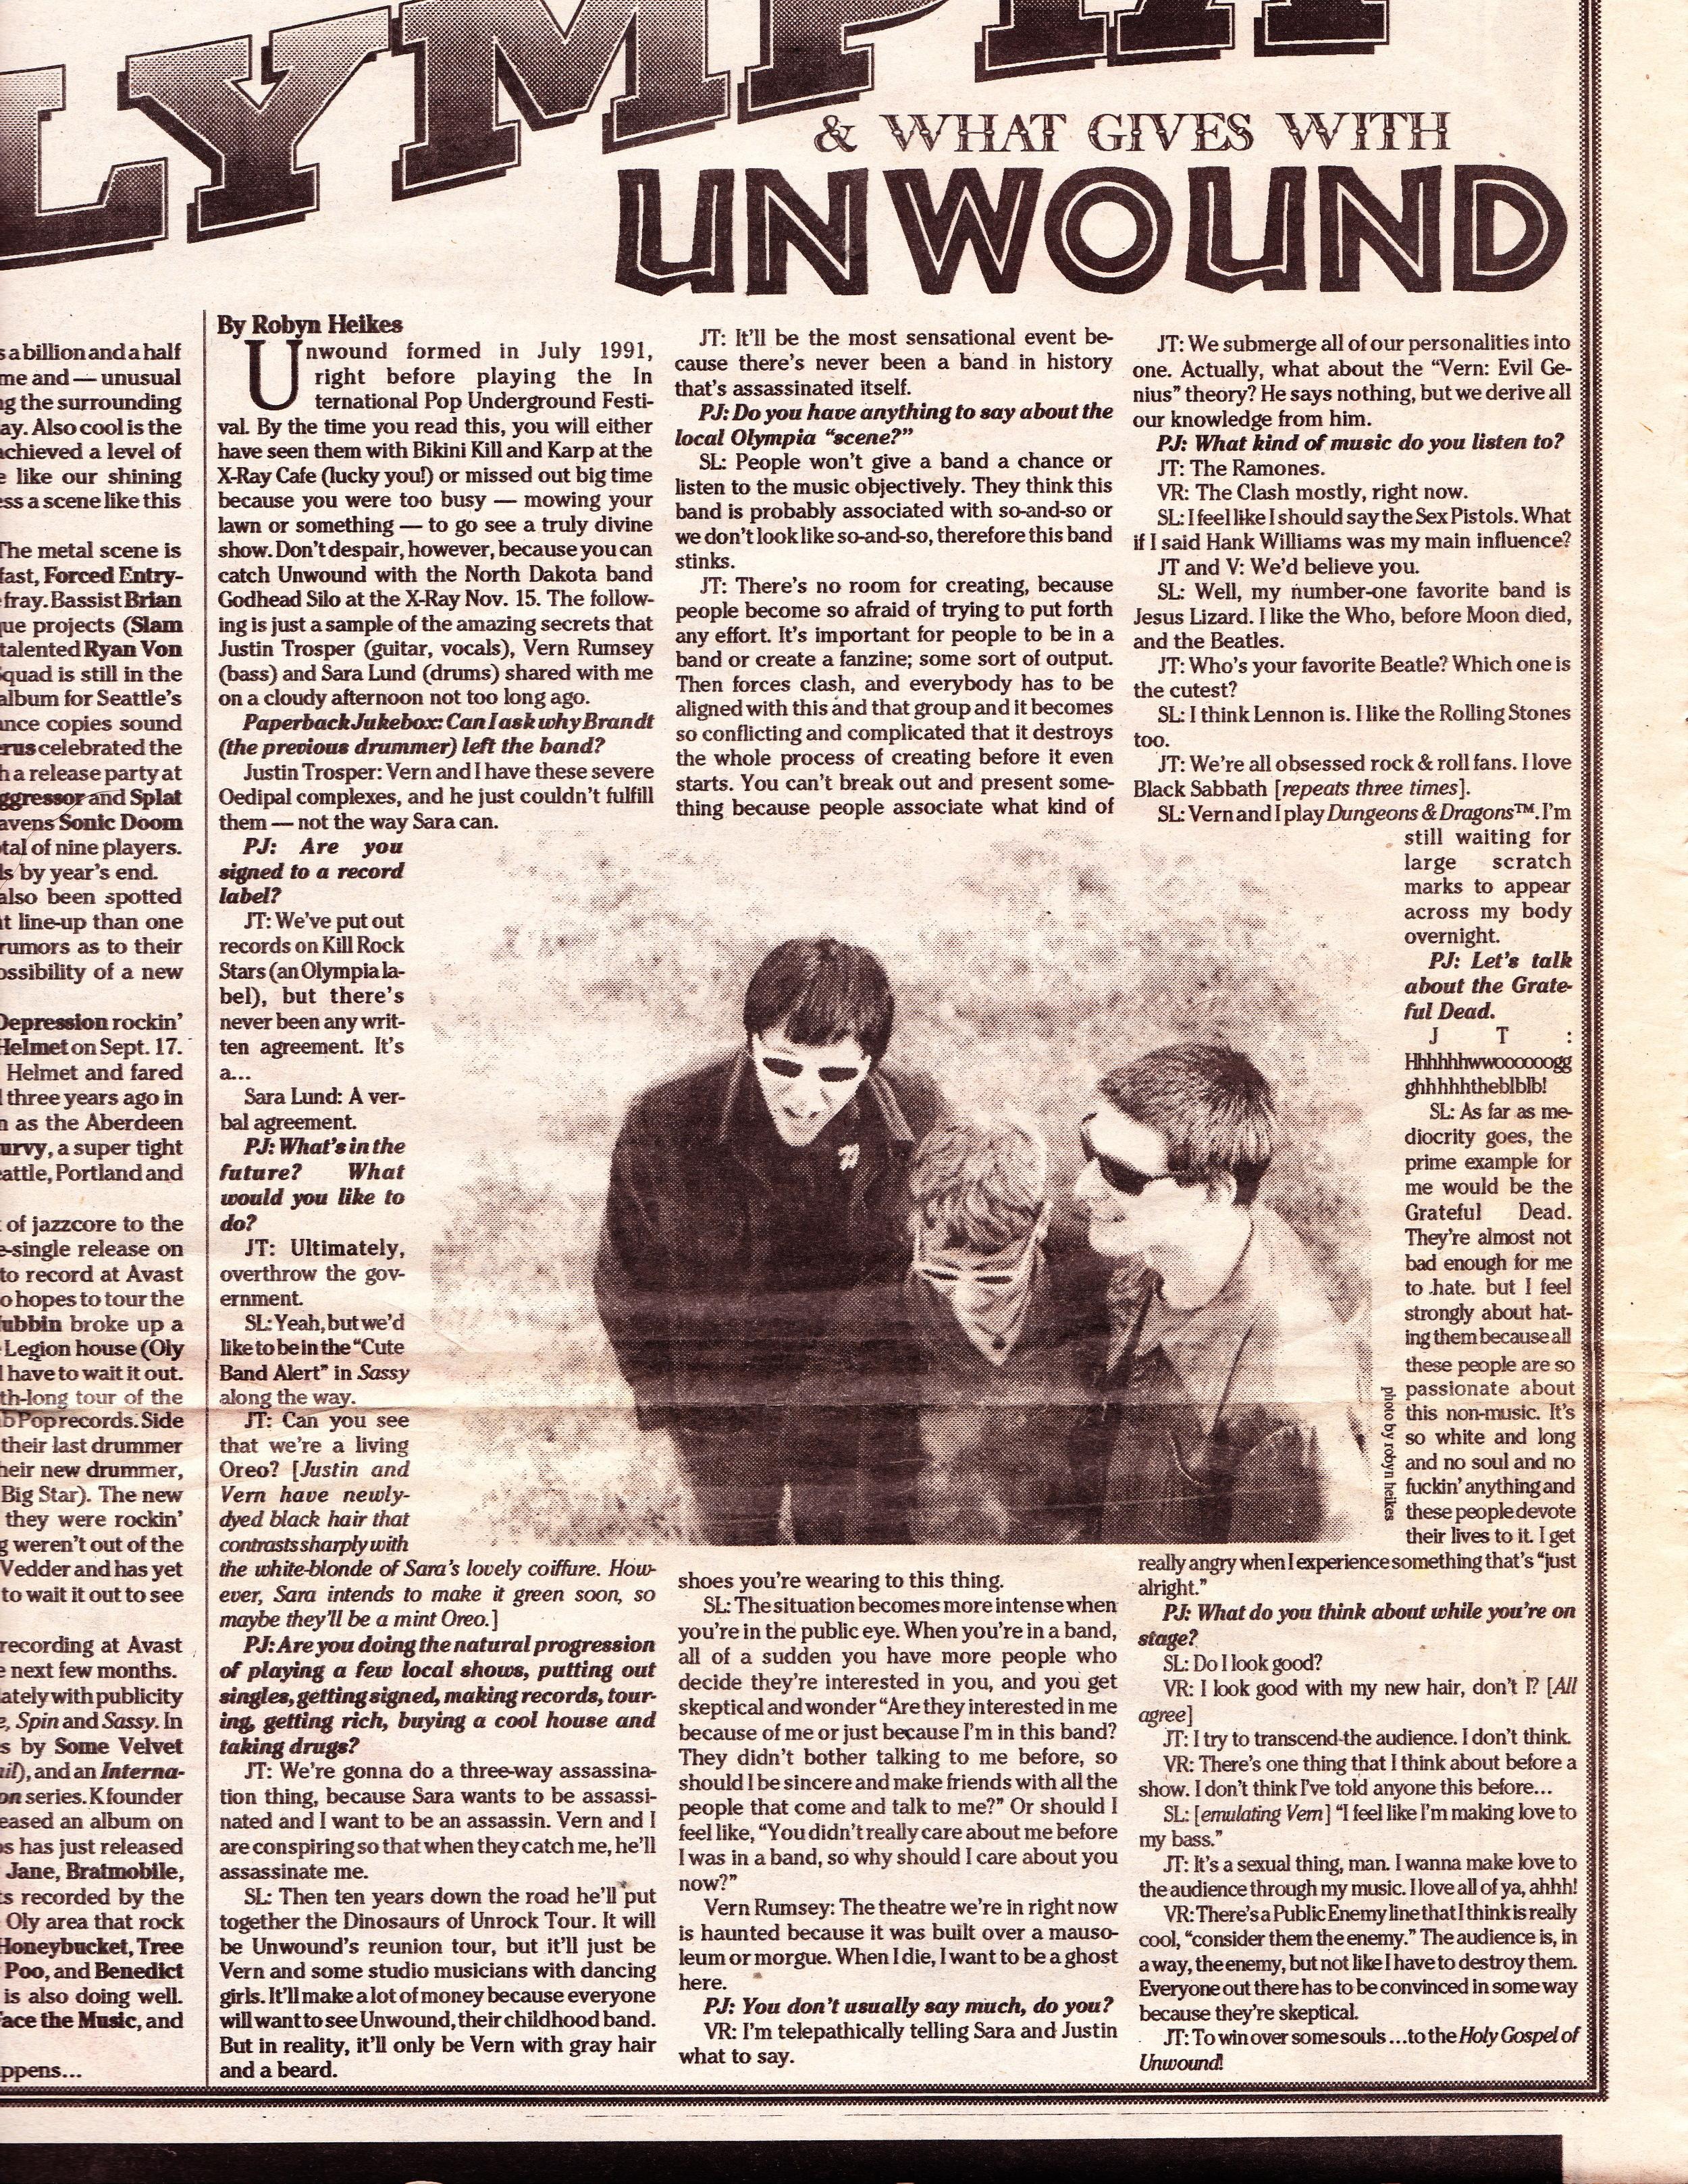 Paperback Jukebox Nov 1992. First interview with Sara as member.